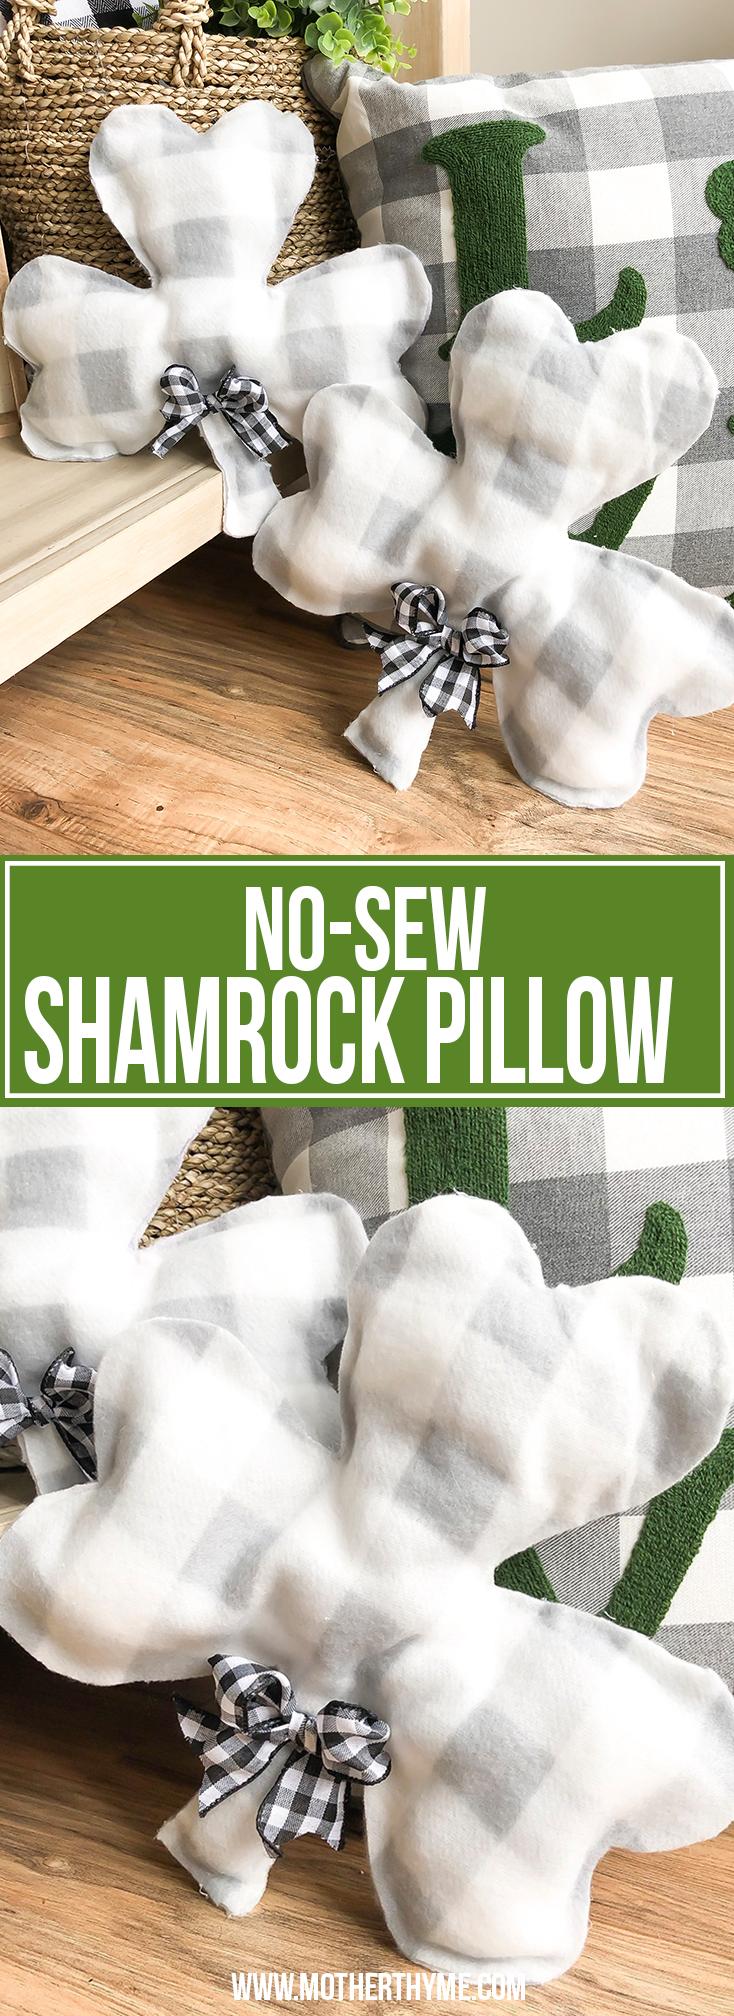 NO-SEW SHAMROCK PILLOW